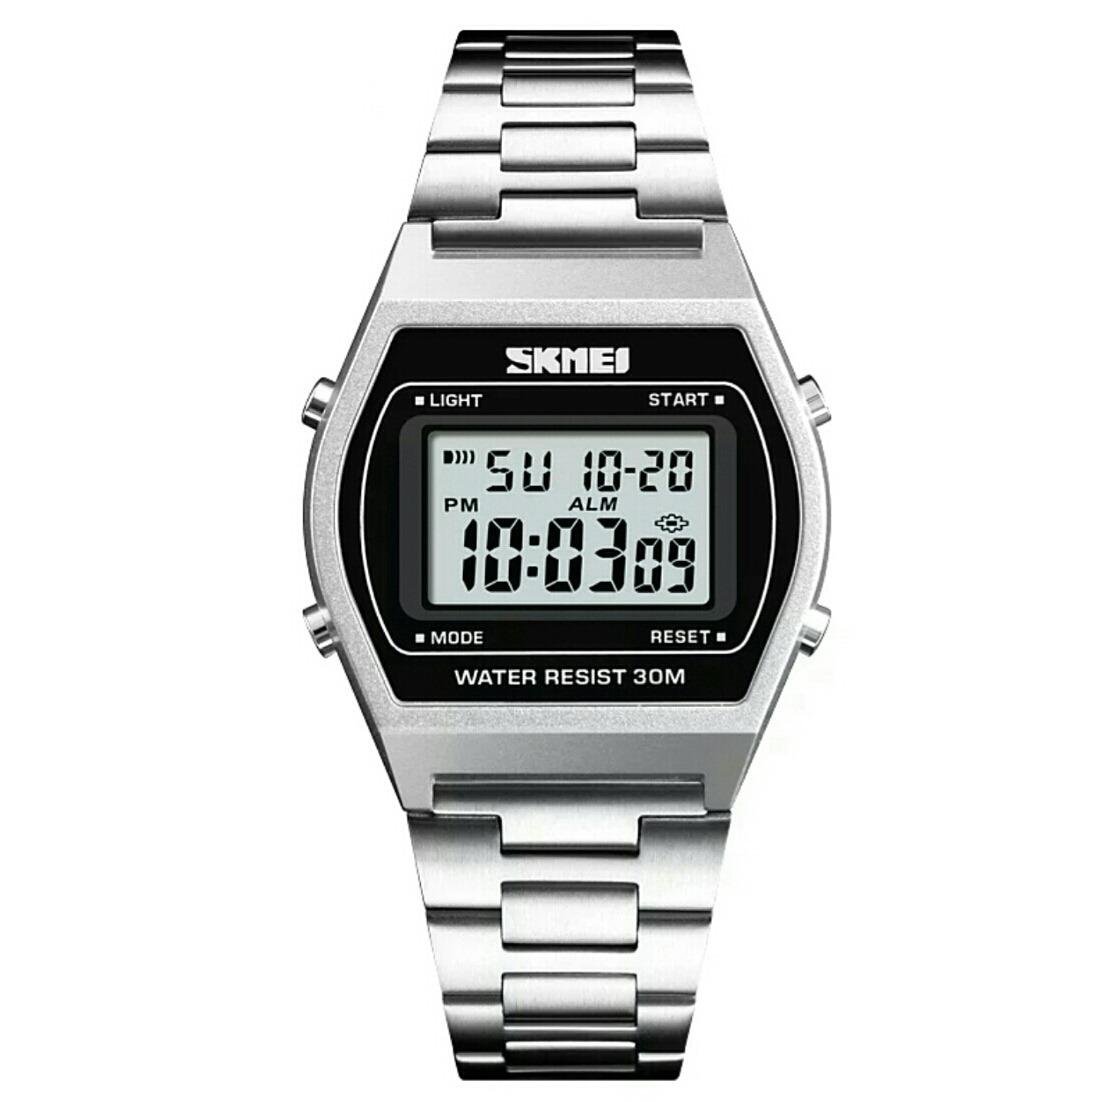 a282691656561 Relógio Esportivo Original Pulseira Prata Modelo Skmei 1328 - R  79 ...